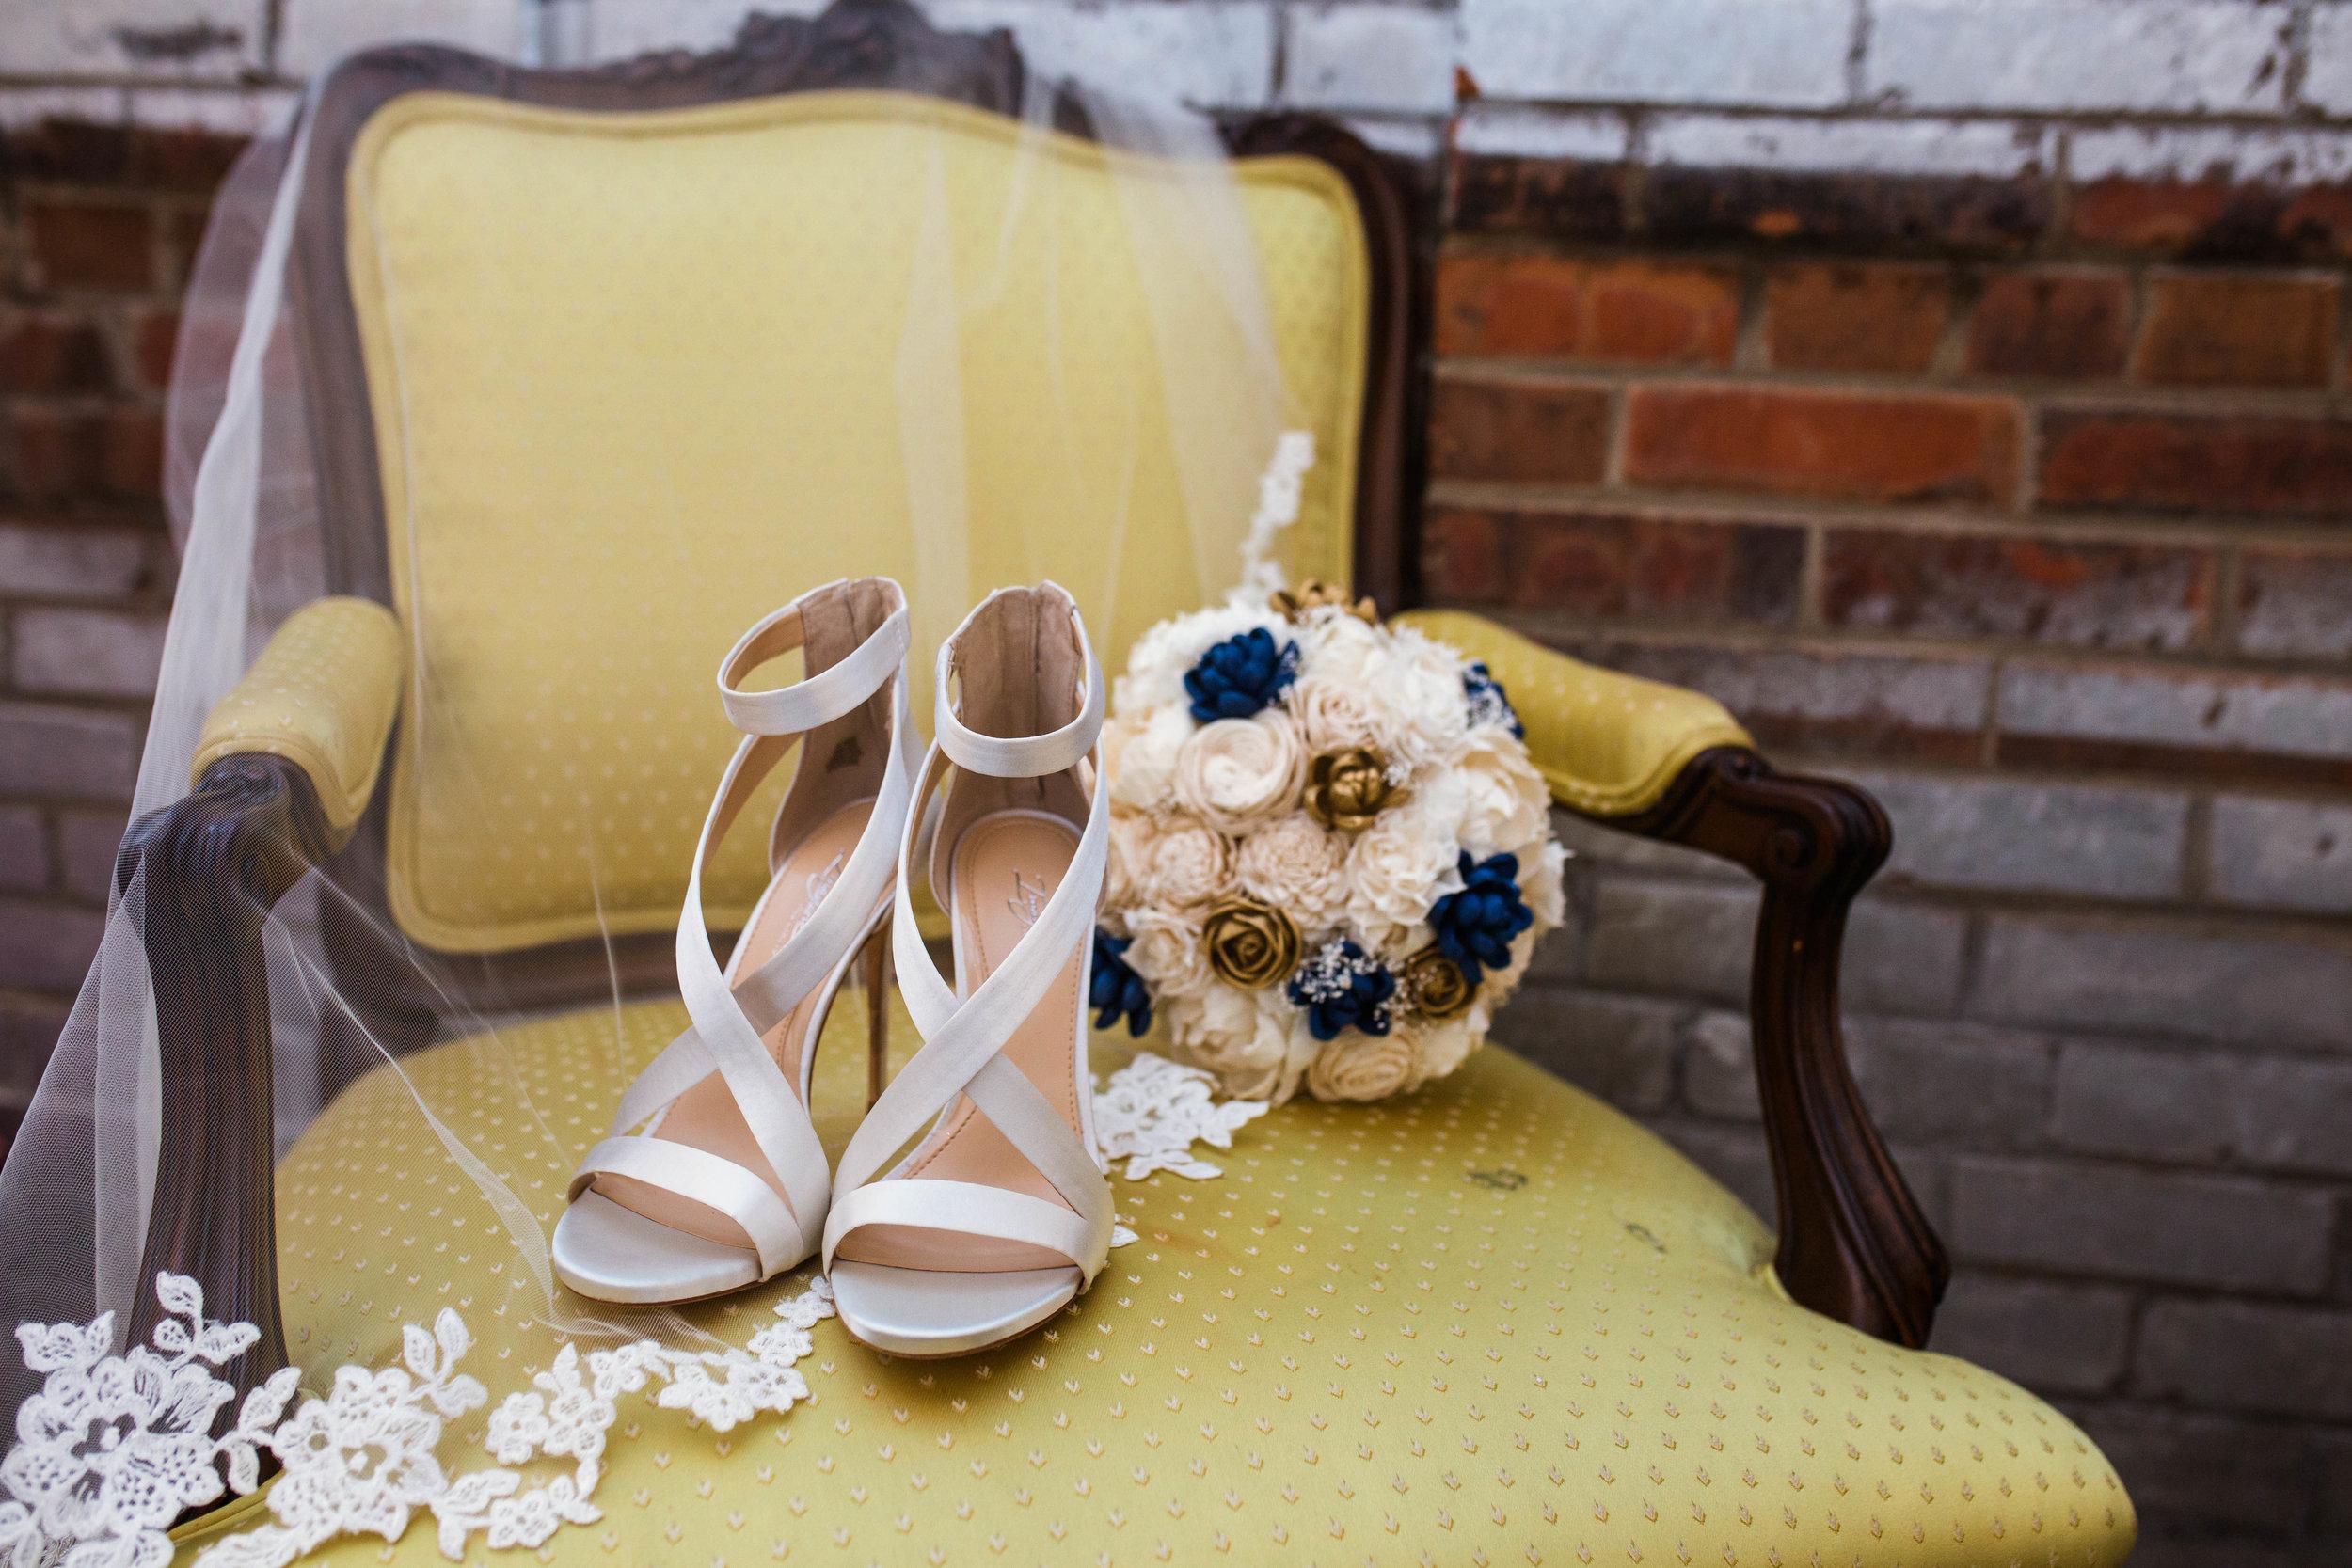 Getting ready and wedding details - raleigh north carolina wedding photographer